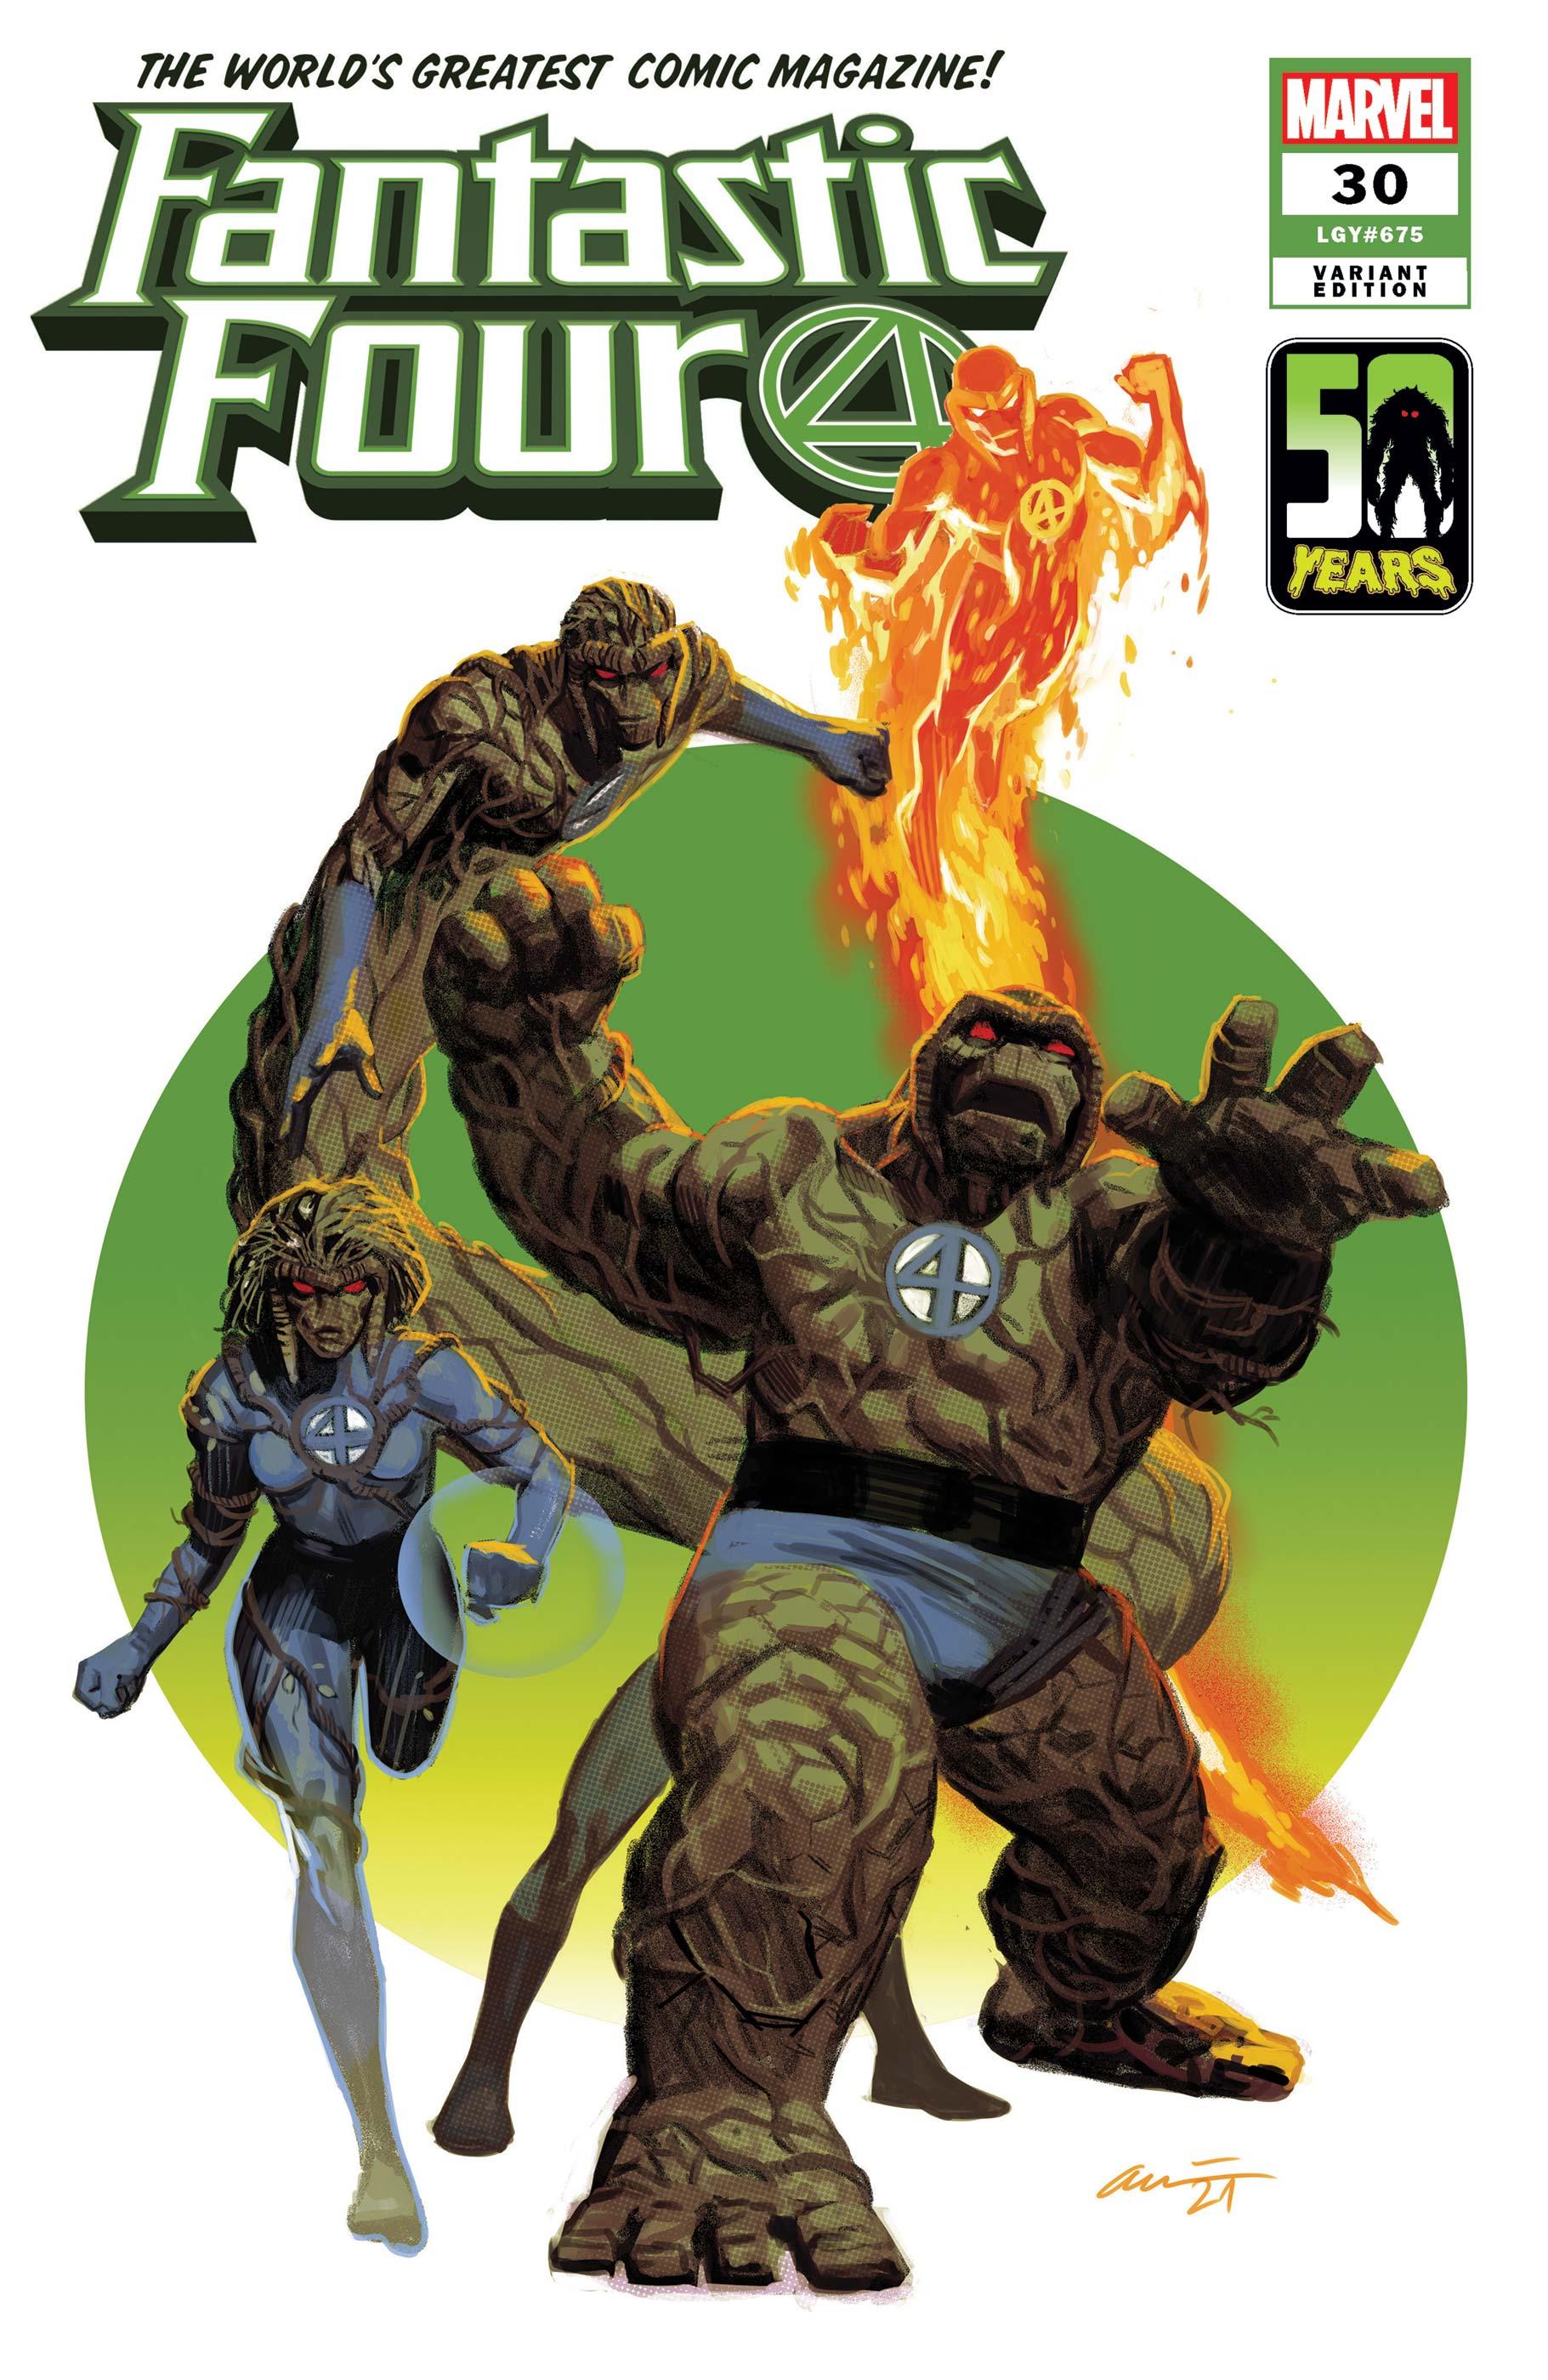 Fantastic Four (2018) #30 (Variant)